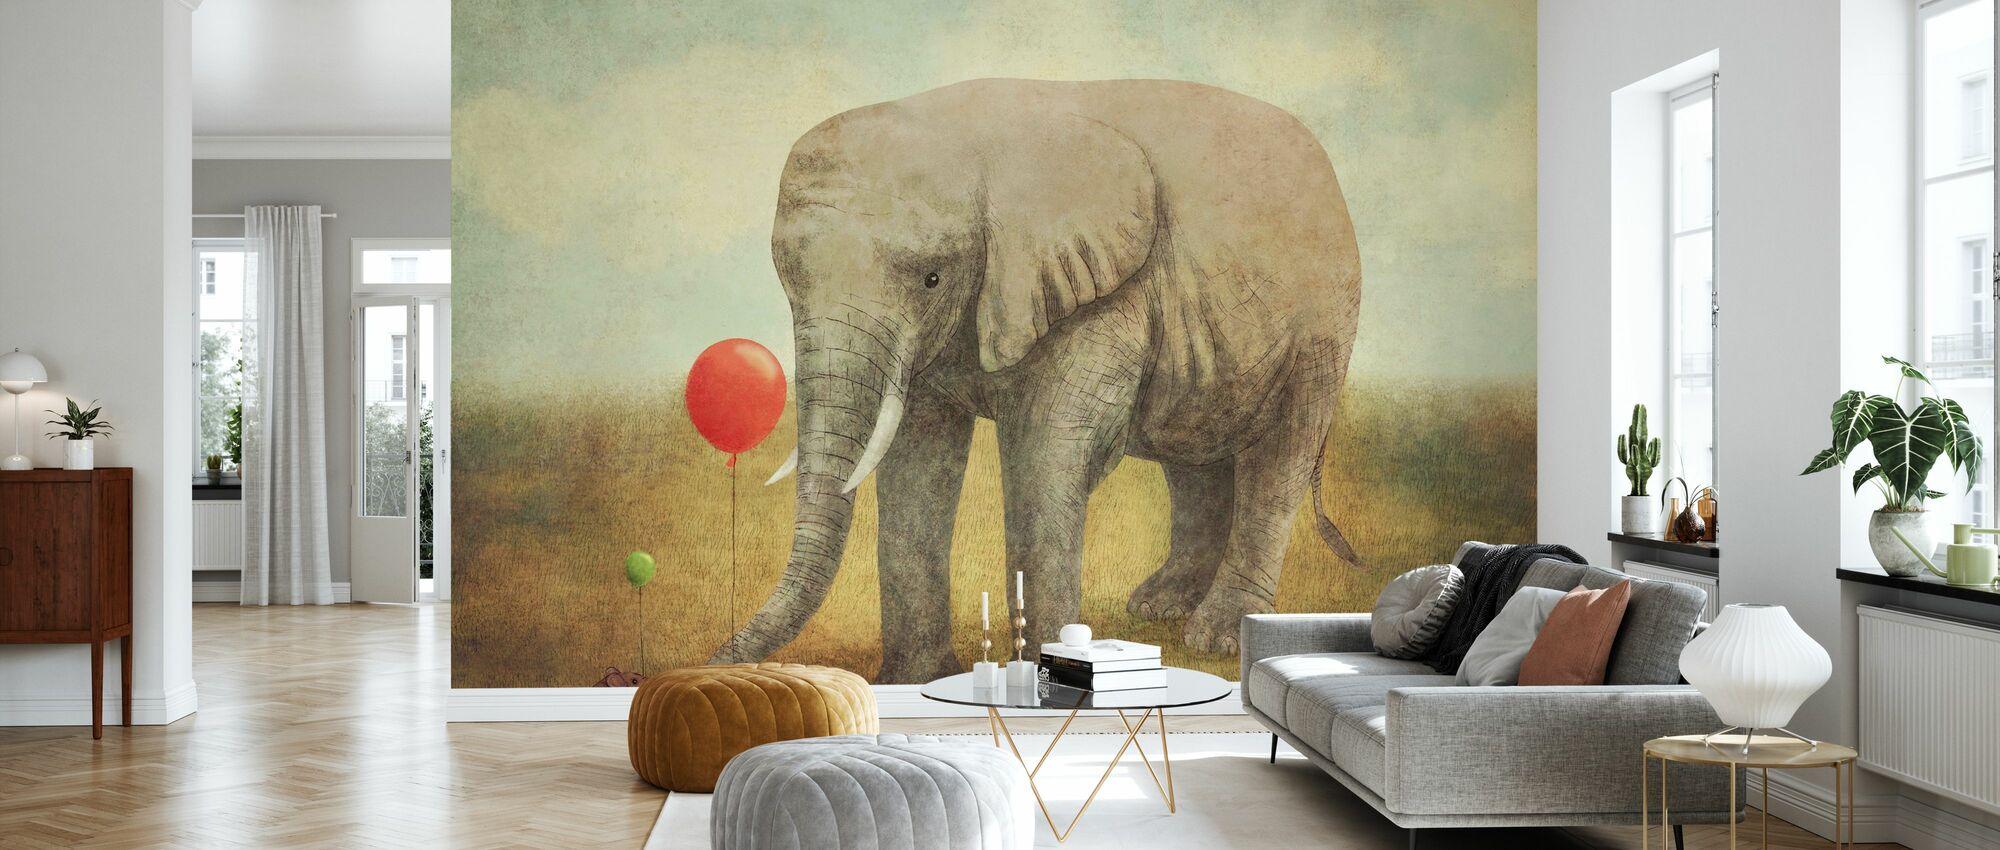 Truce - Wallpaper - Living Room